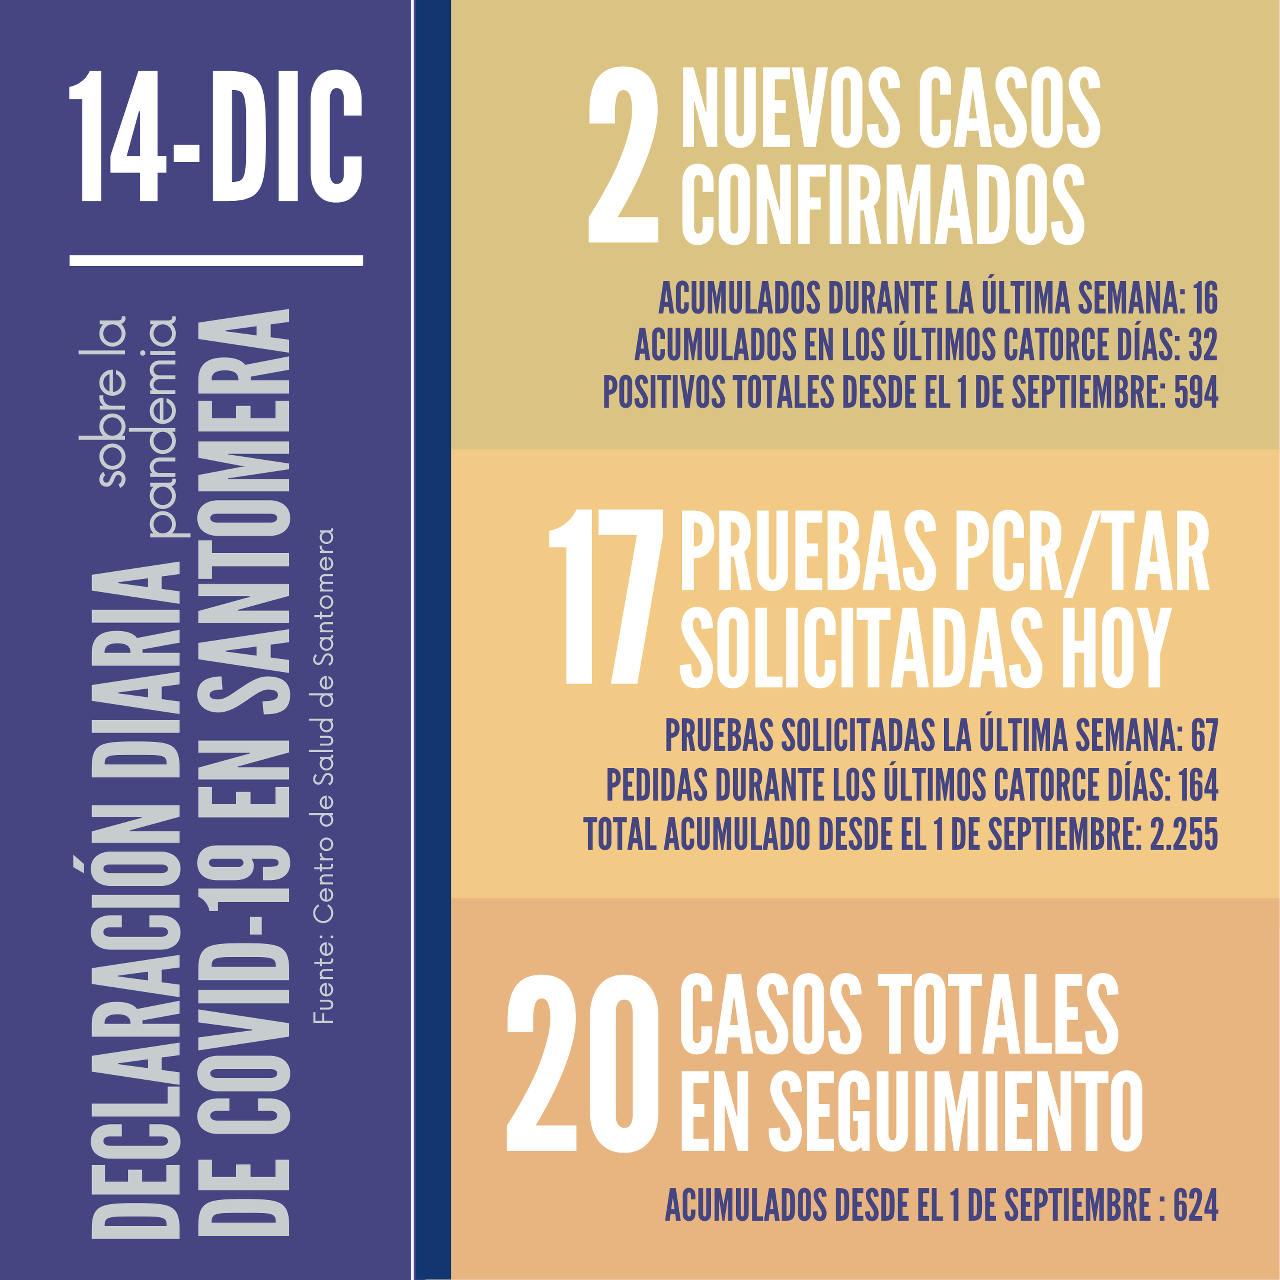 20201214_Datos COVID-19 Santomera